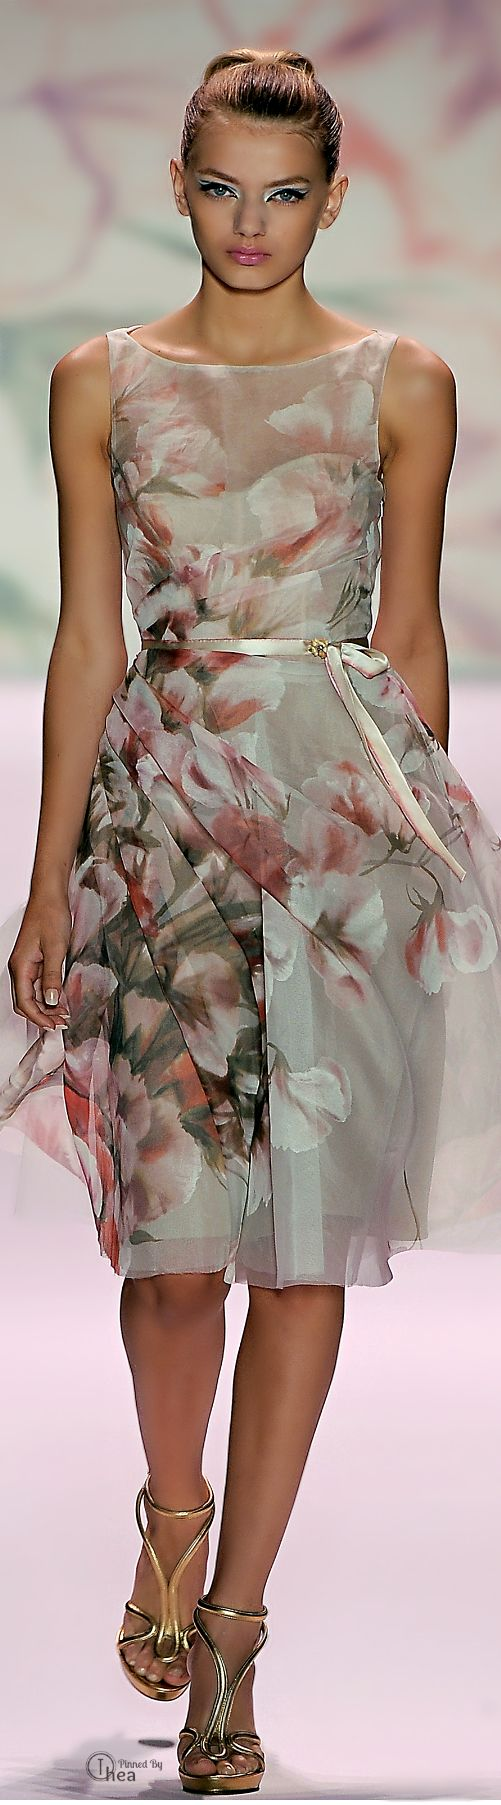 Monique Lhuillier women fashion clothing style apparel @RORESS closet ideas